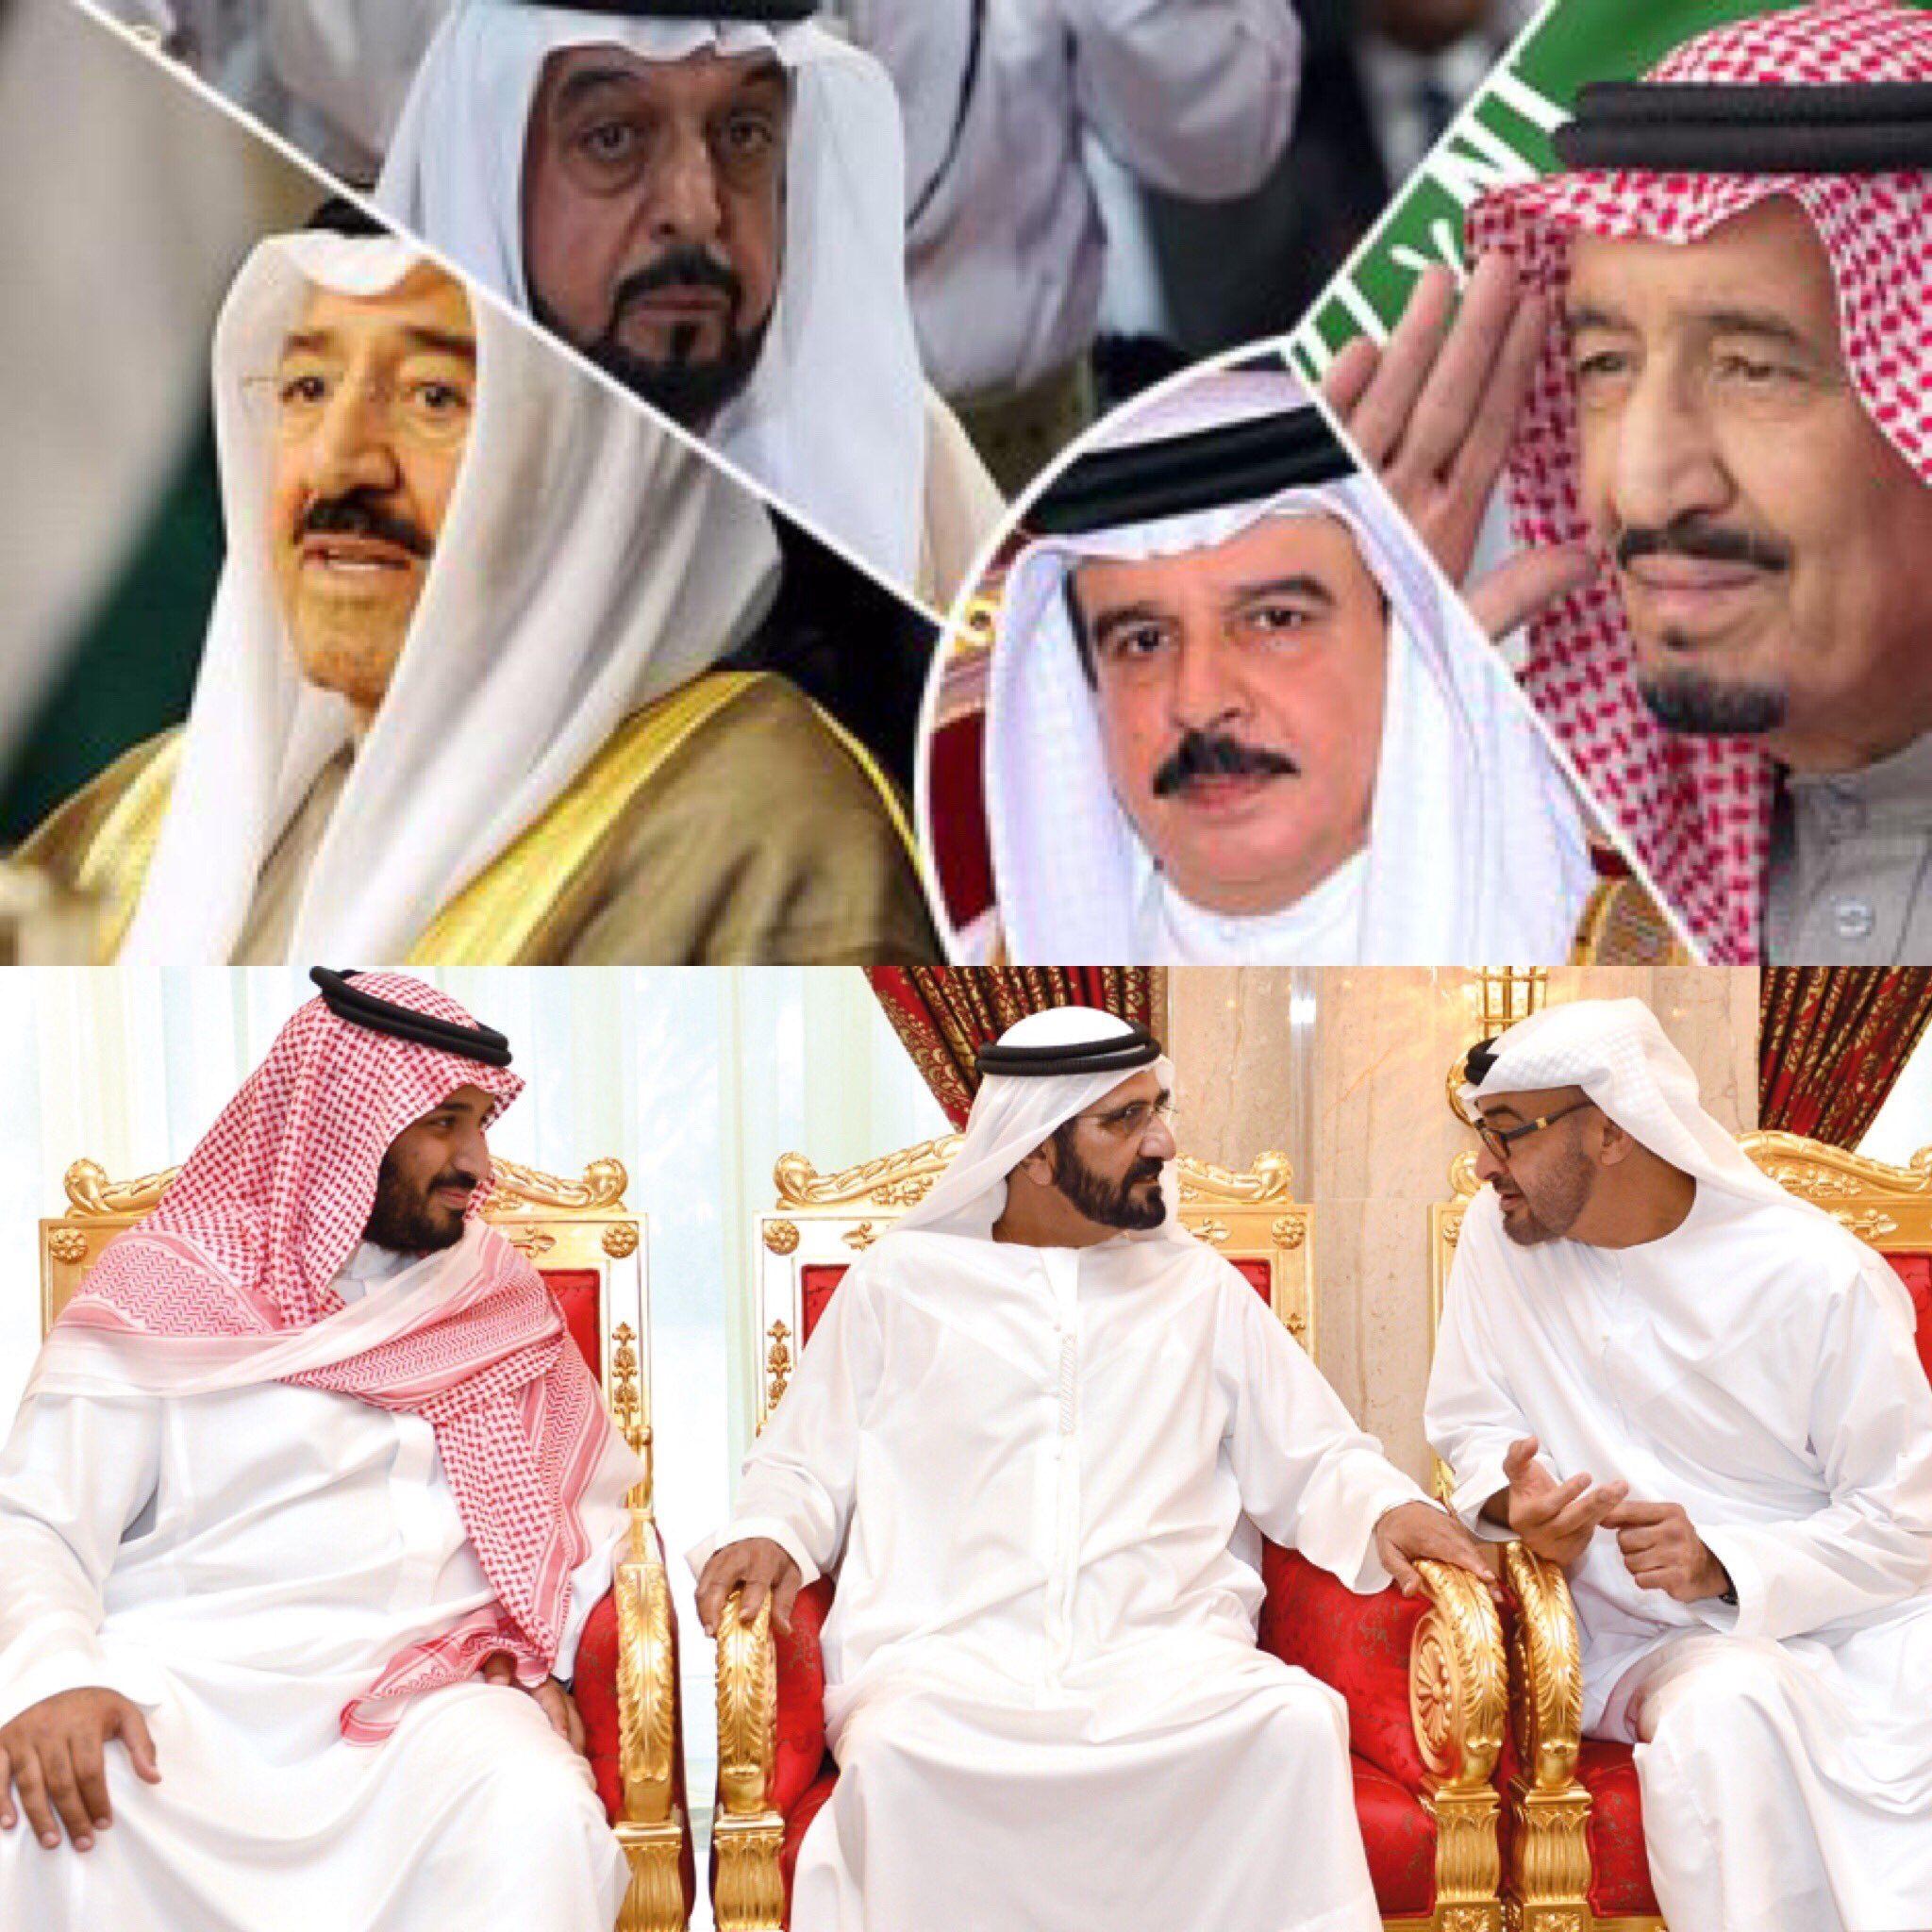 الله يحفظكم ويعزكم King Queen Royal Family Royal